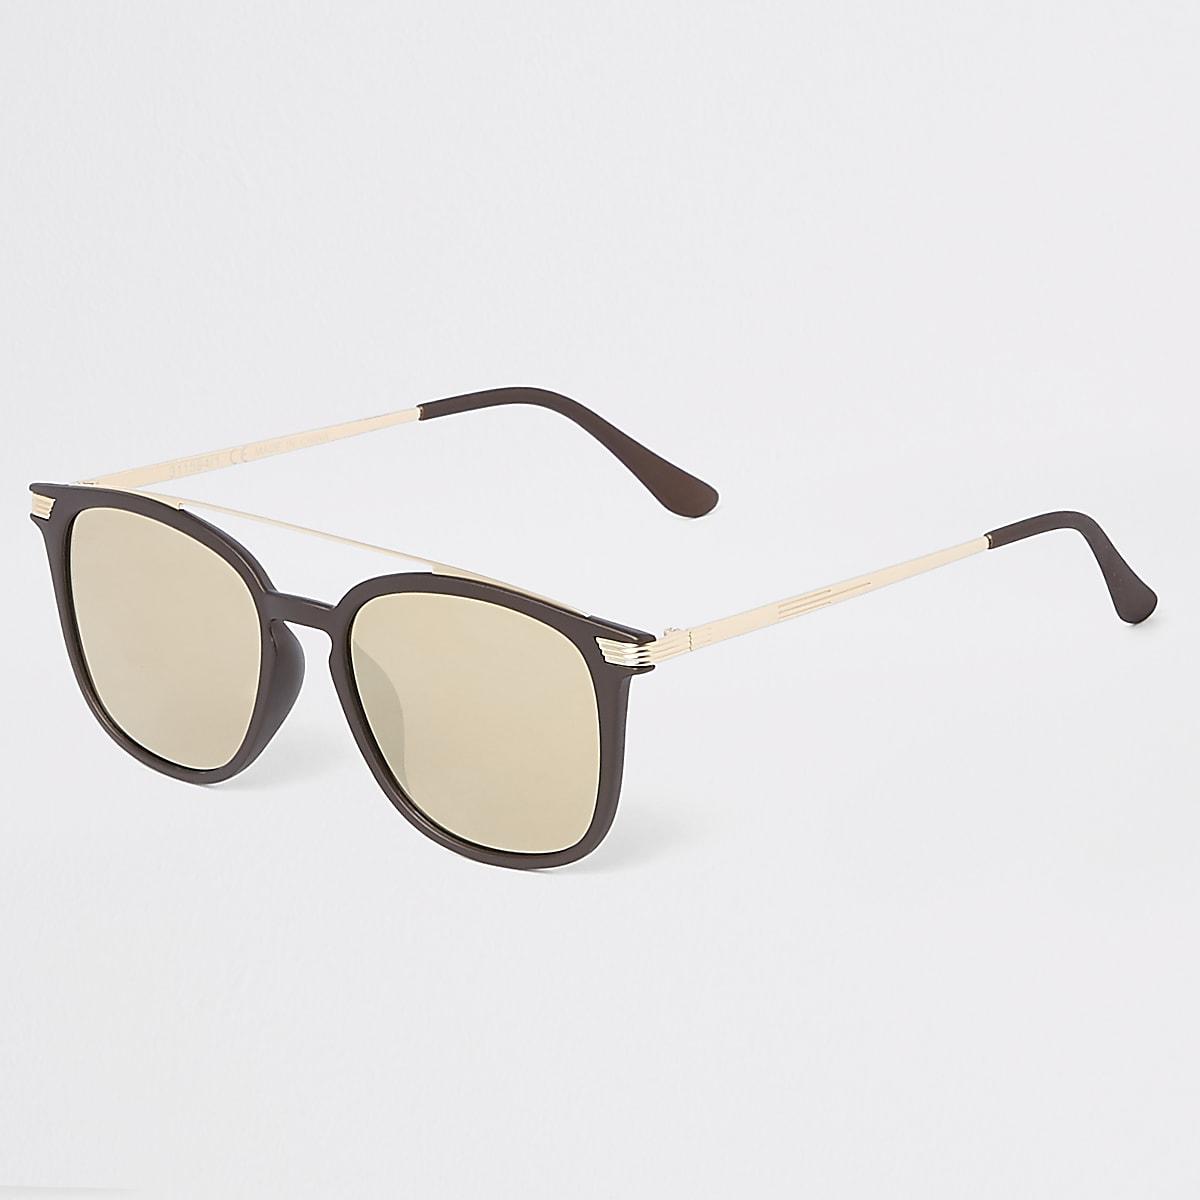 621f1d7cc Brown brow bar navigator sunglasses - Aviator Sunglasses ...